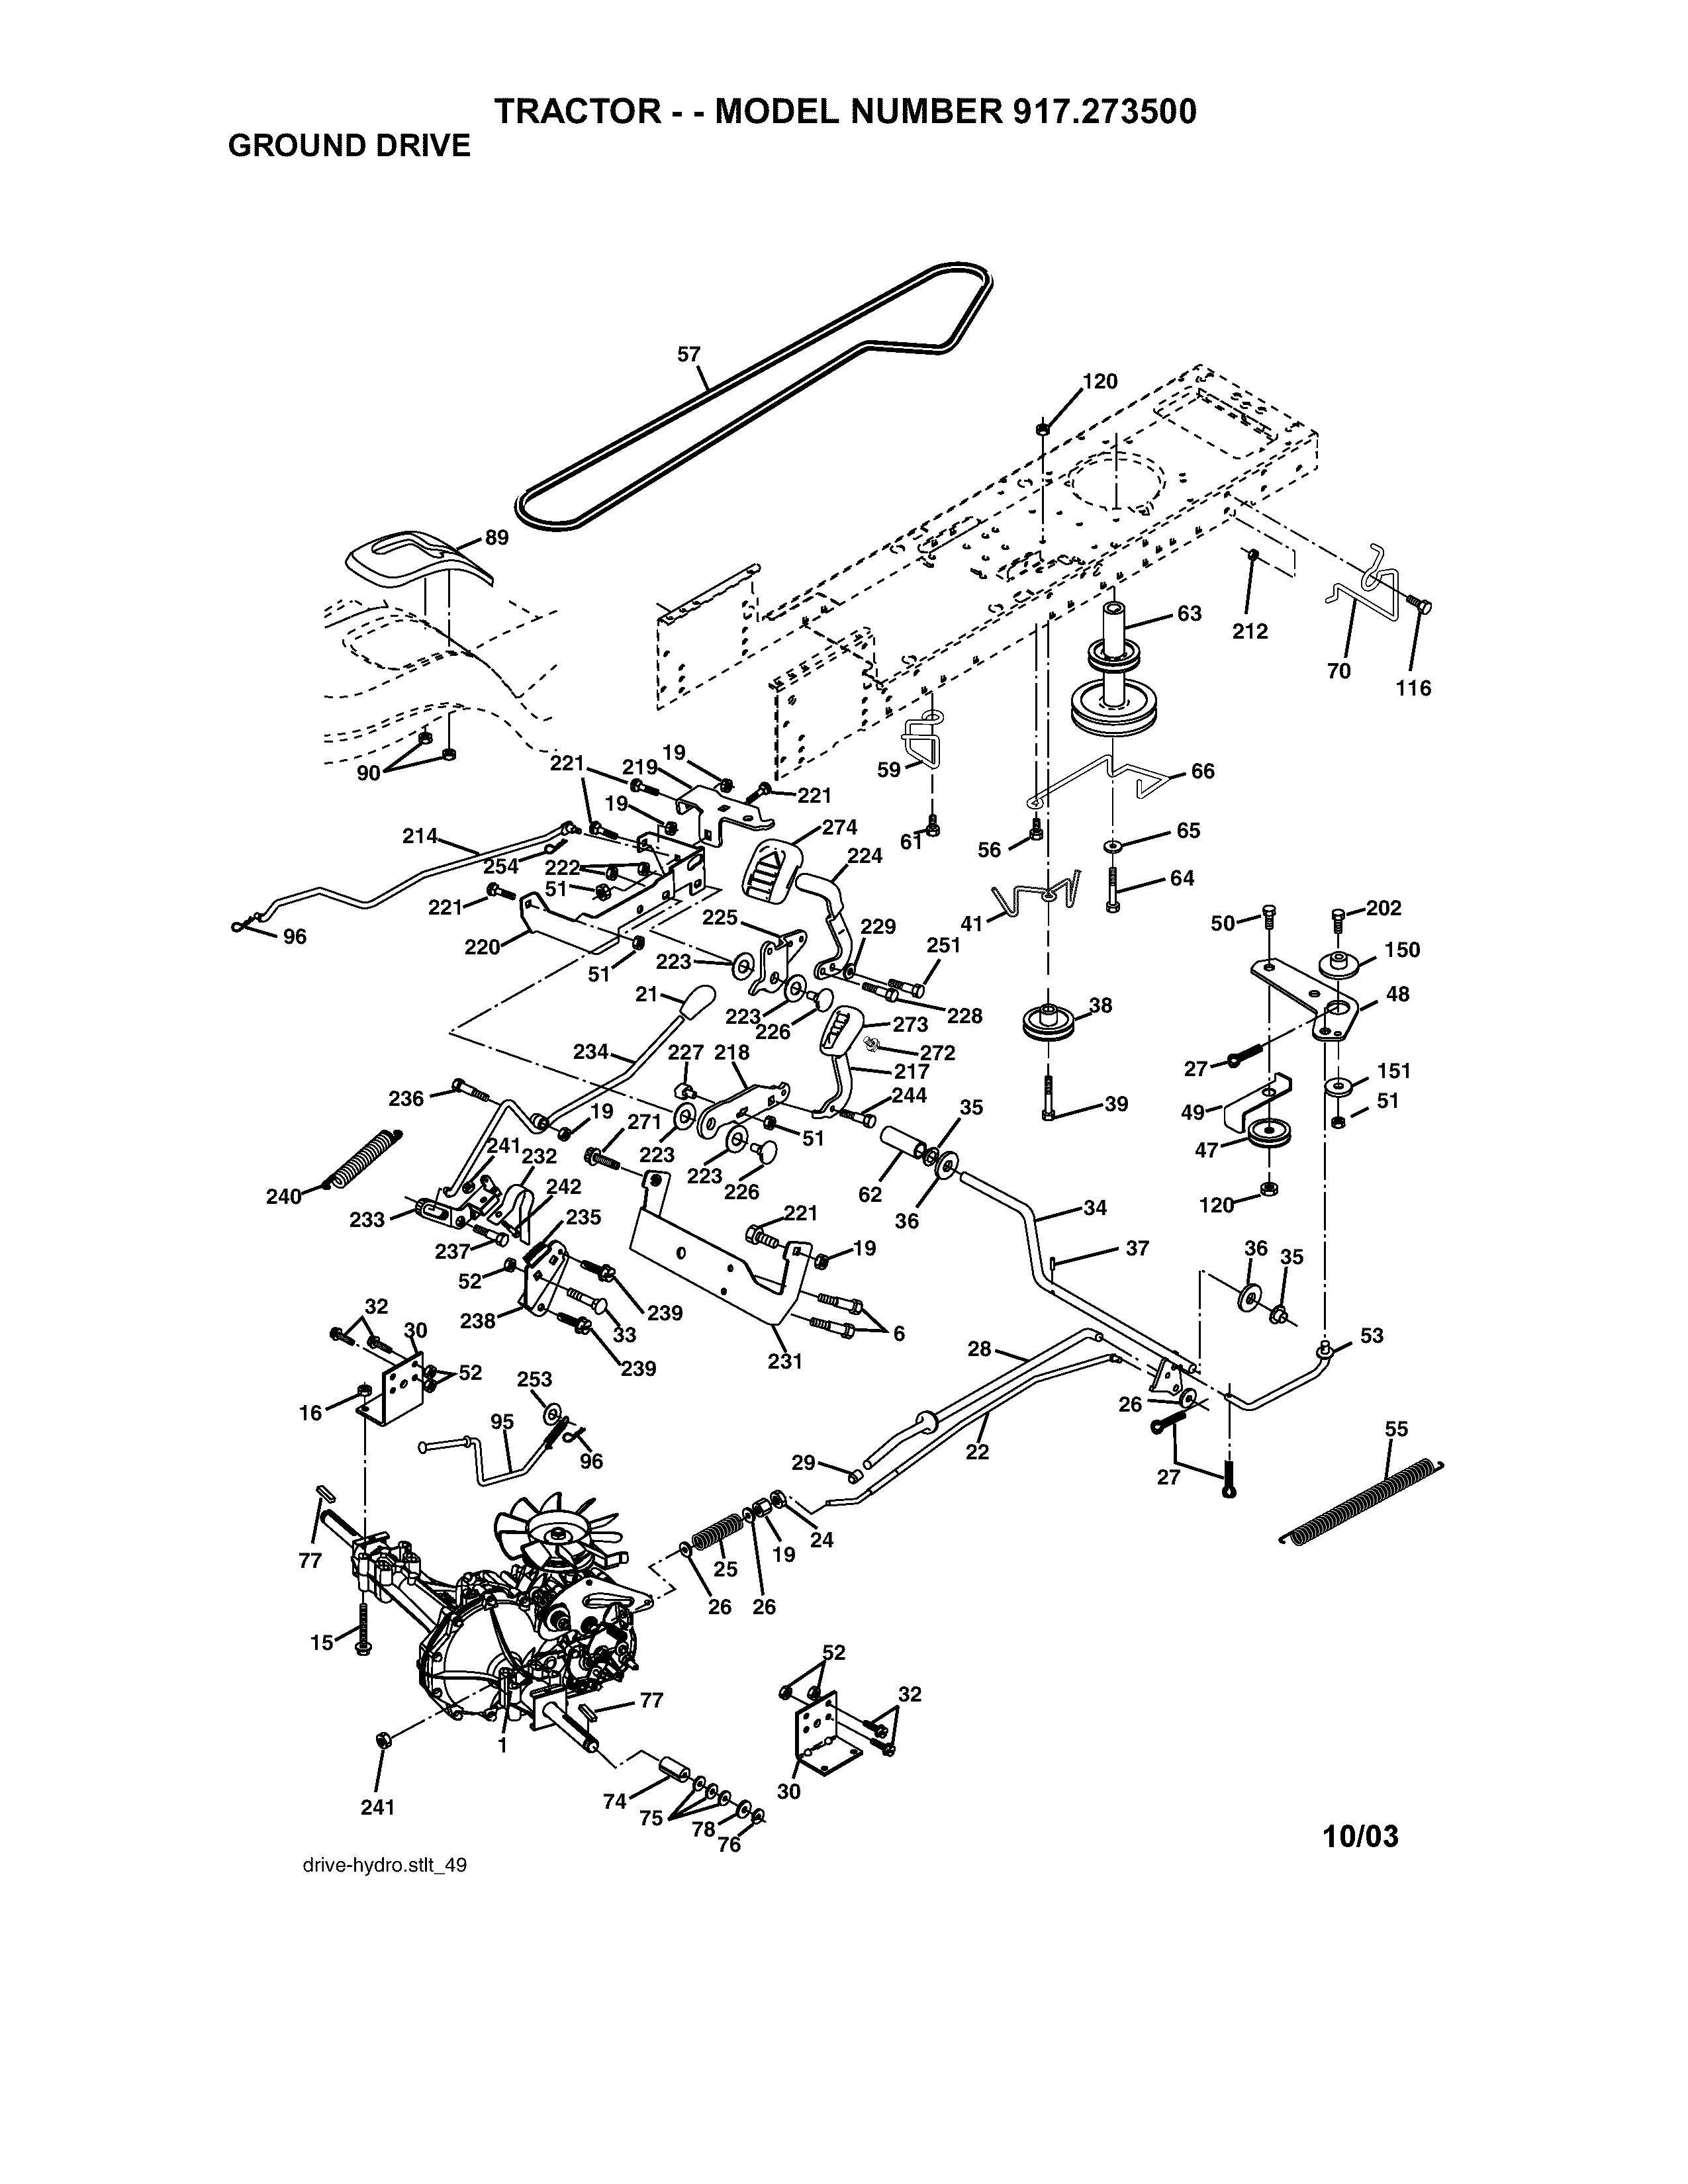 Craftsman Lawn Mower Engine Parts Diagram 917 Craftsman Lawn Tractor 16 5 Hp 42 In Mower Electric Of Craftsman Lawn Mower Engine Parts Diagram